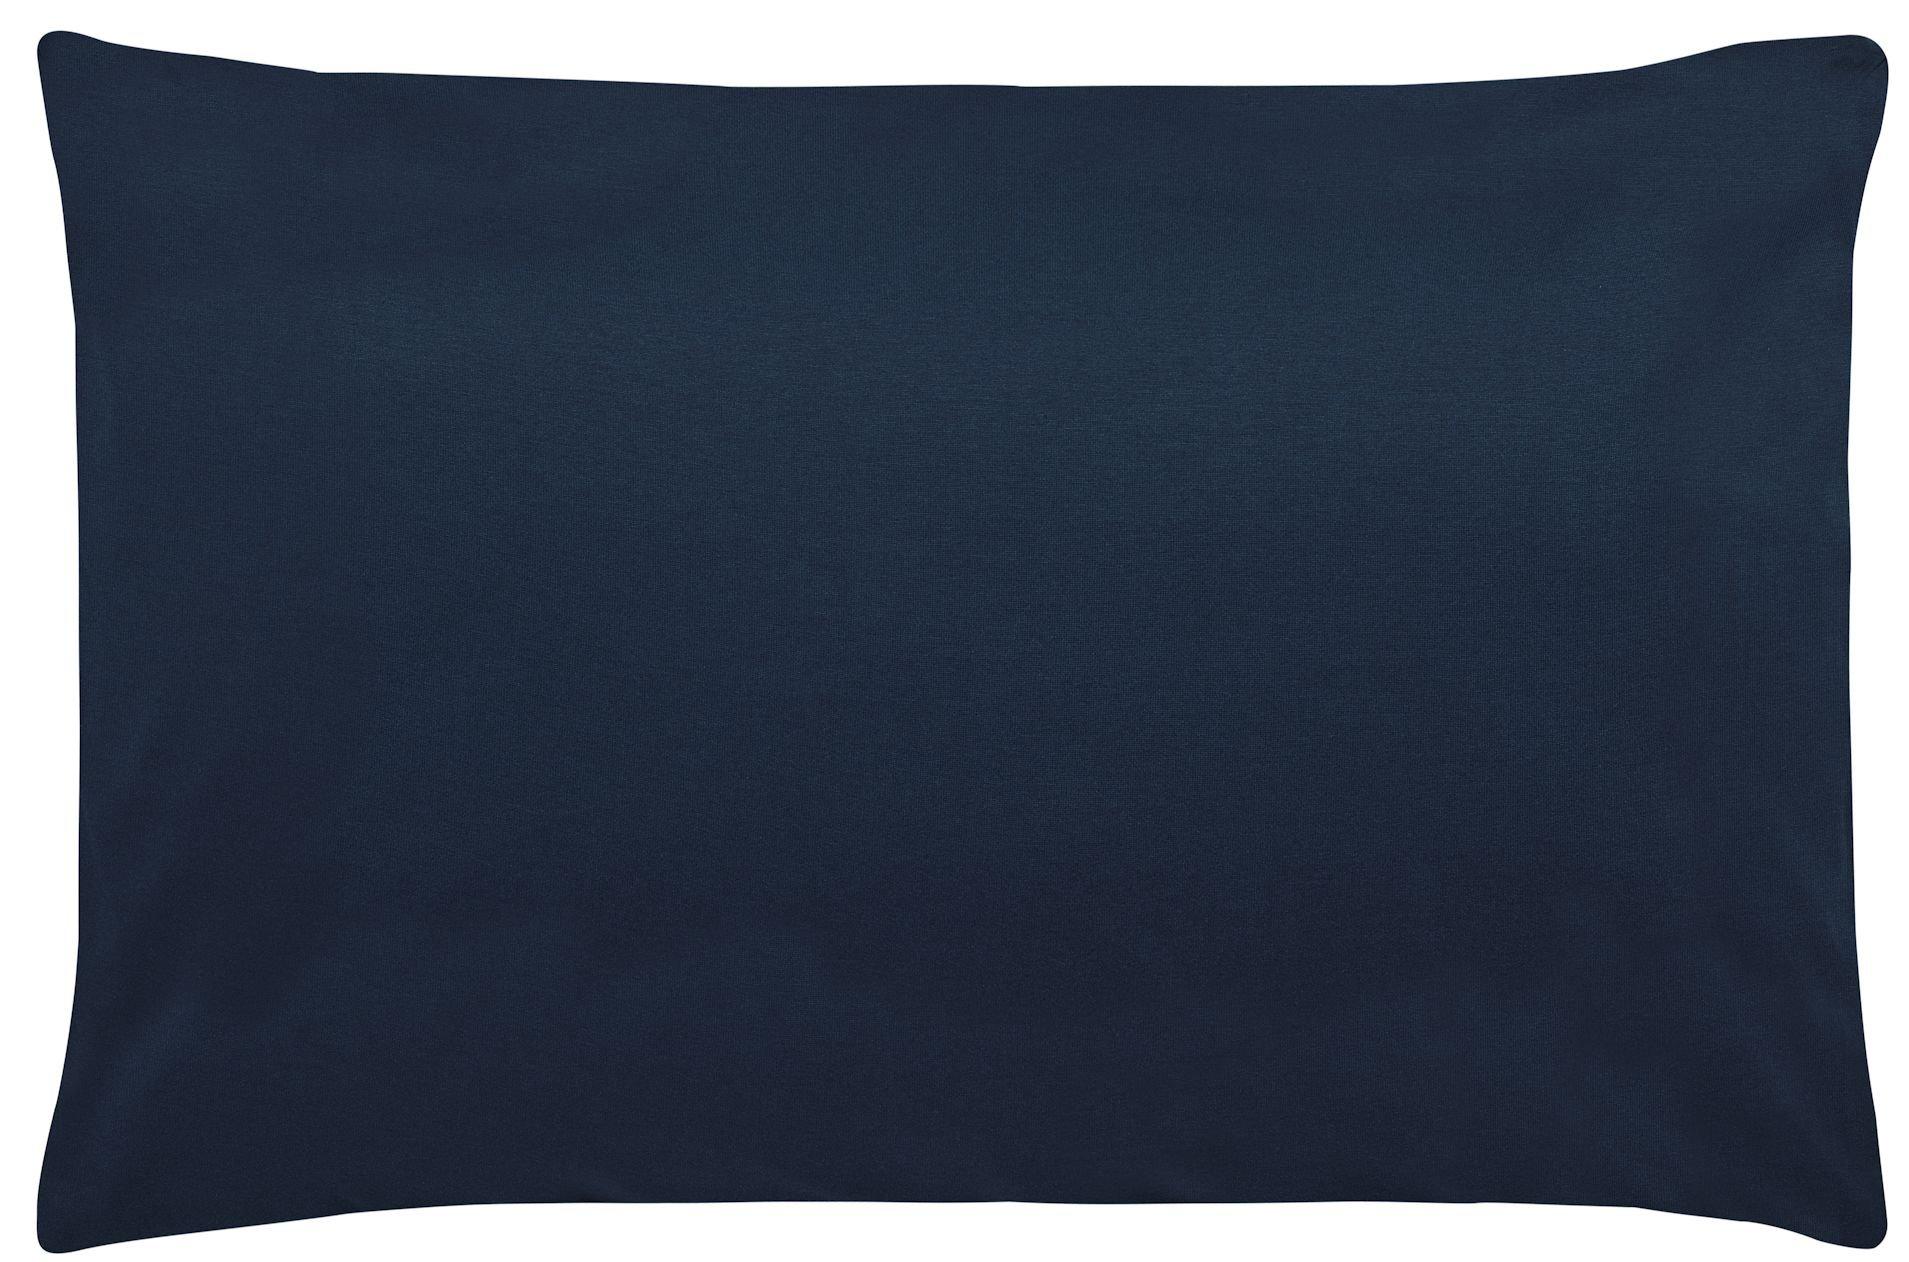 K.-Bezug marine 40x60cm